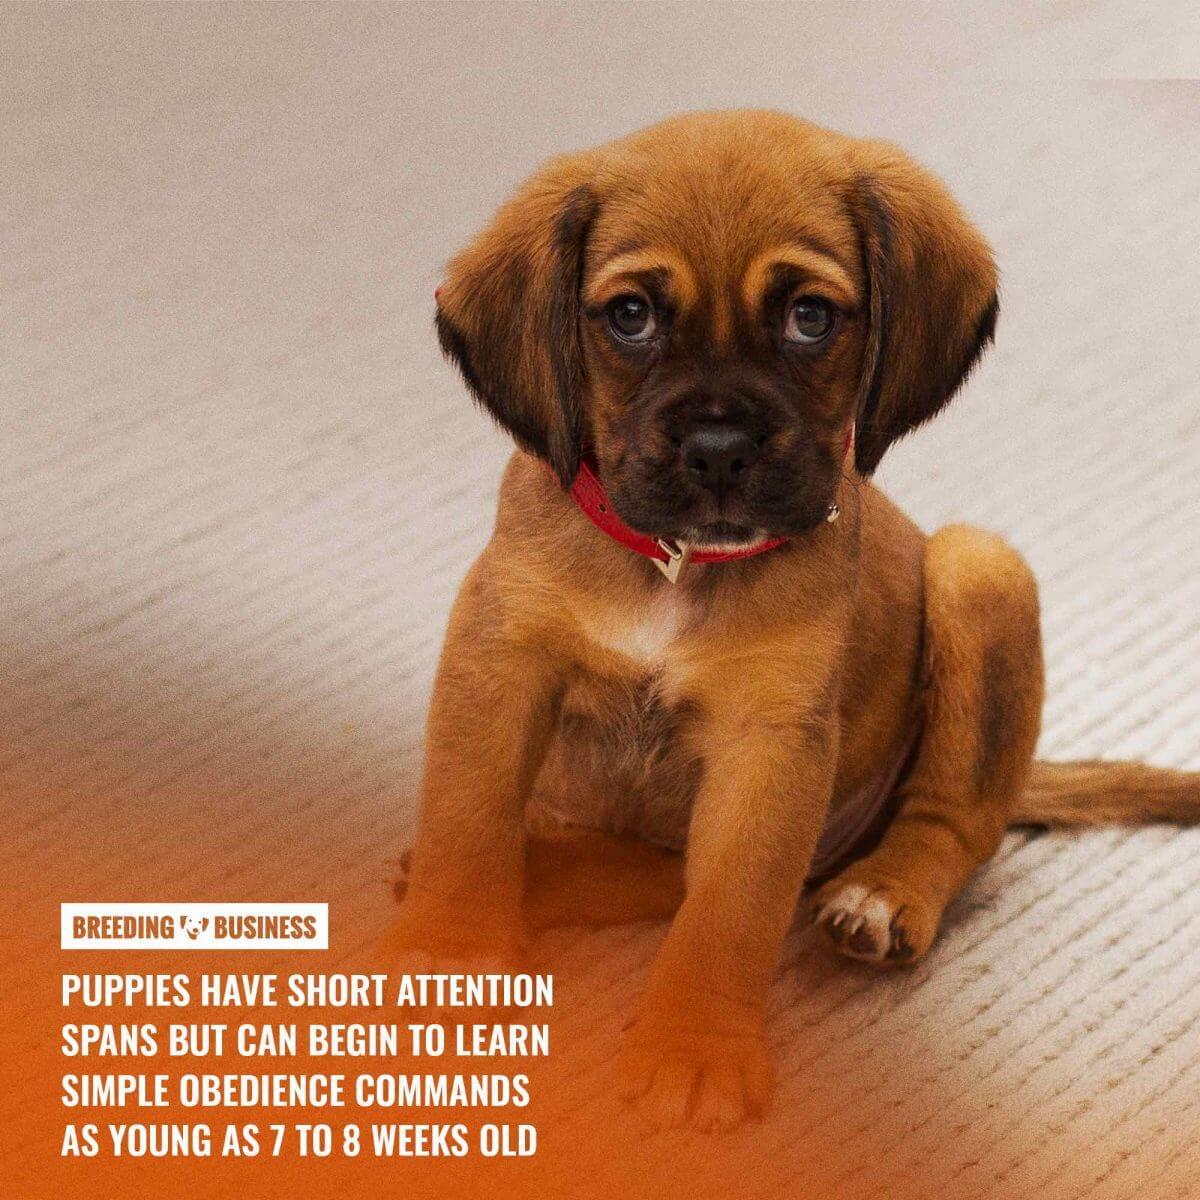 puppy training (short attention span)